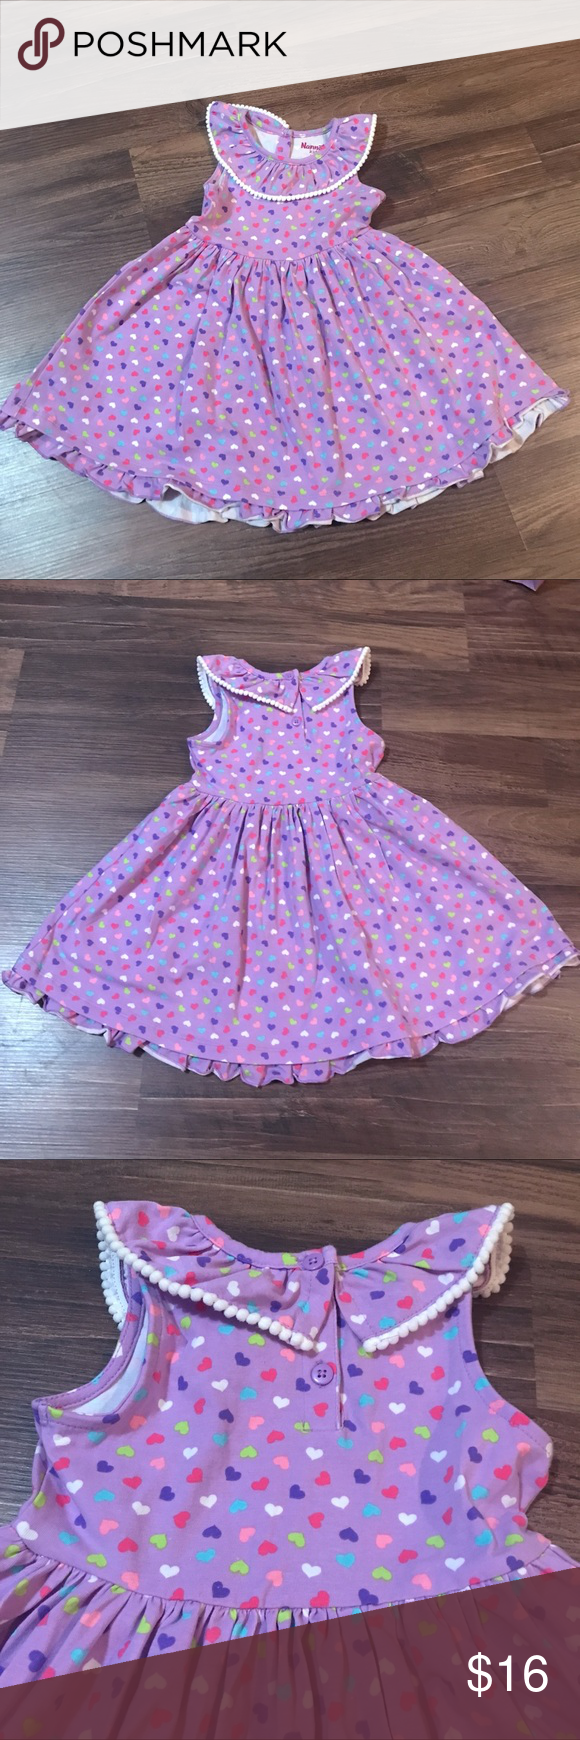 Nannette Kids Collar Tank Heart Dot Dress 4t Dot Dress Kids Dresses Dresses [ 1740 x 580 Pixel ]